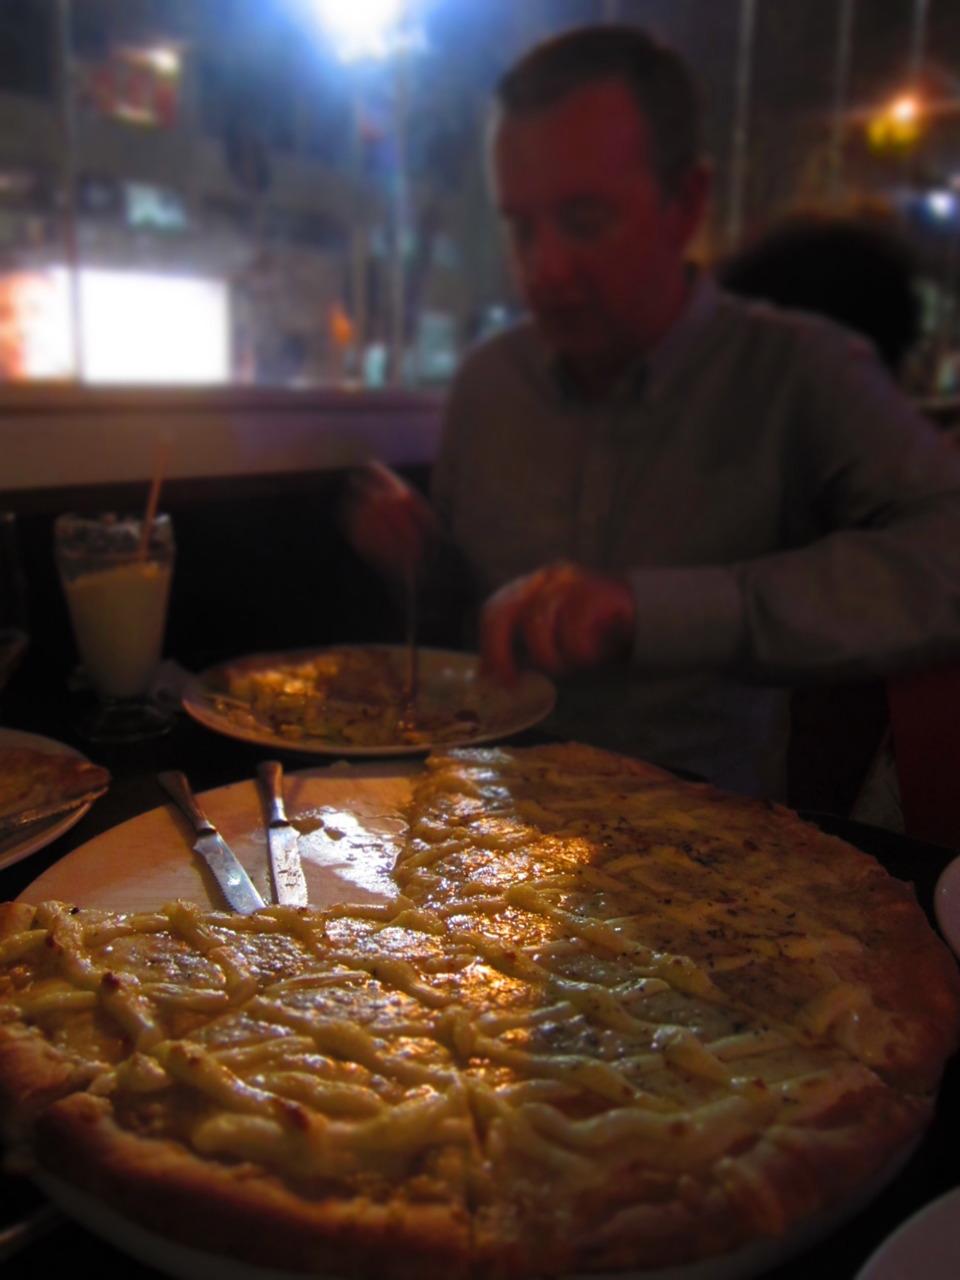 Stephen v. four-cheese pizza. Rio de Janeiro, BR